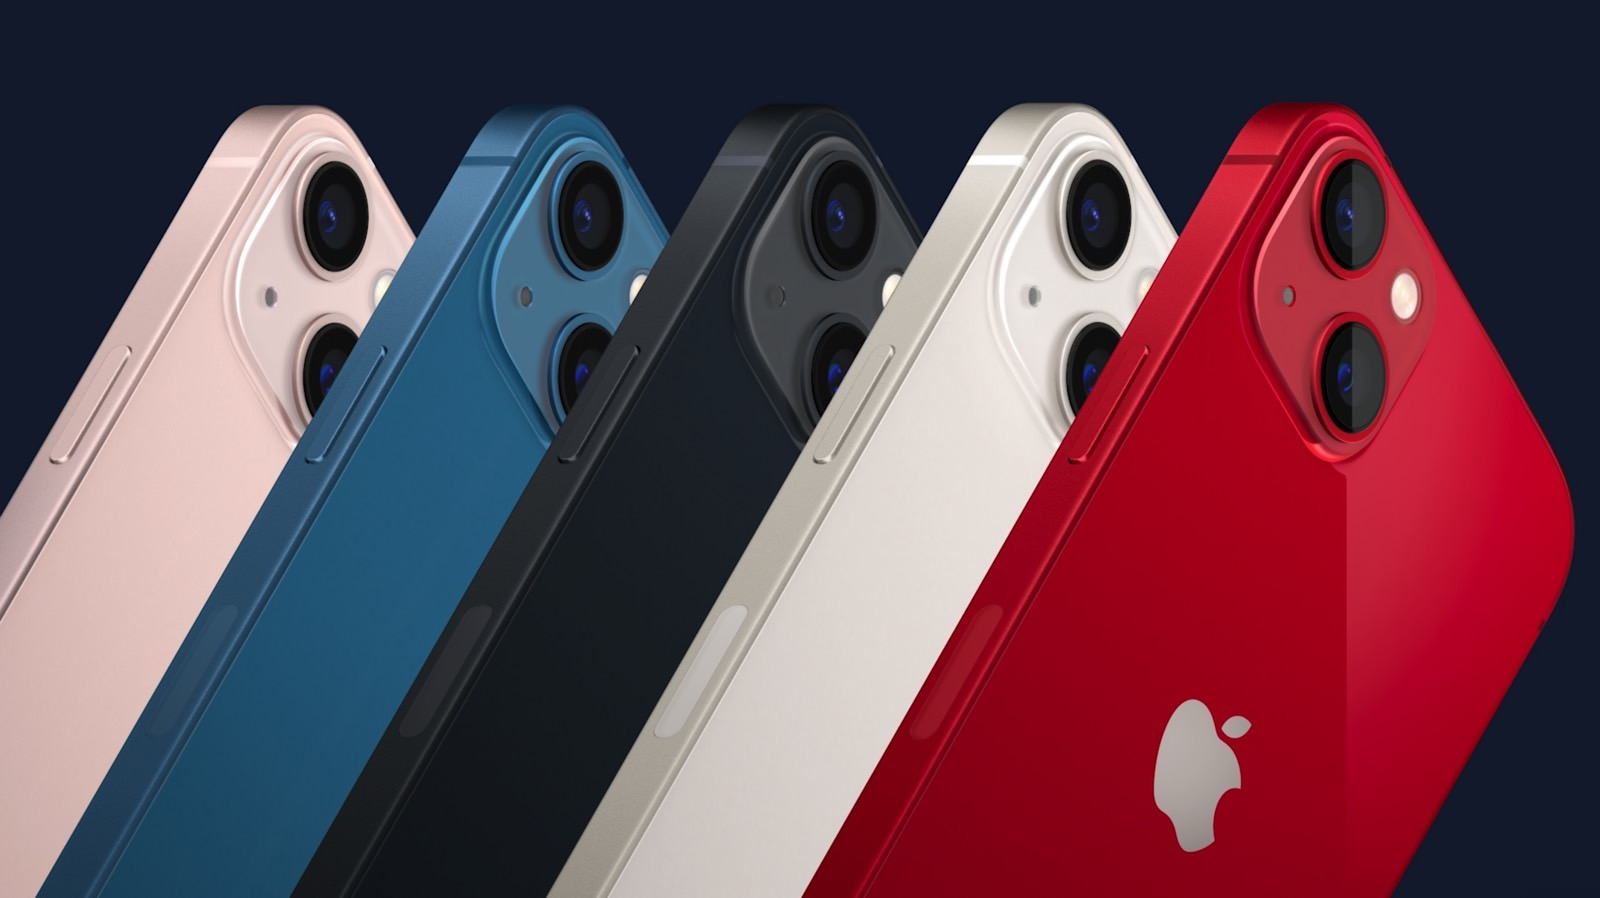 apple-event-iphone-13-pro-max-61